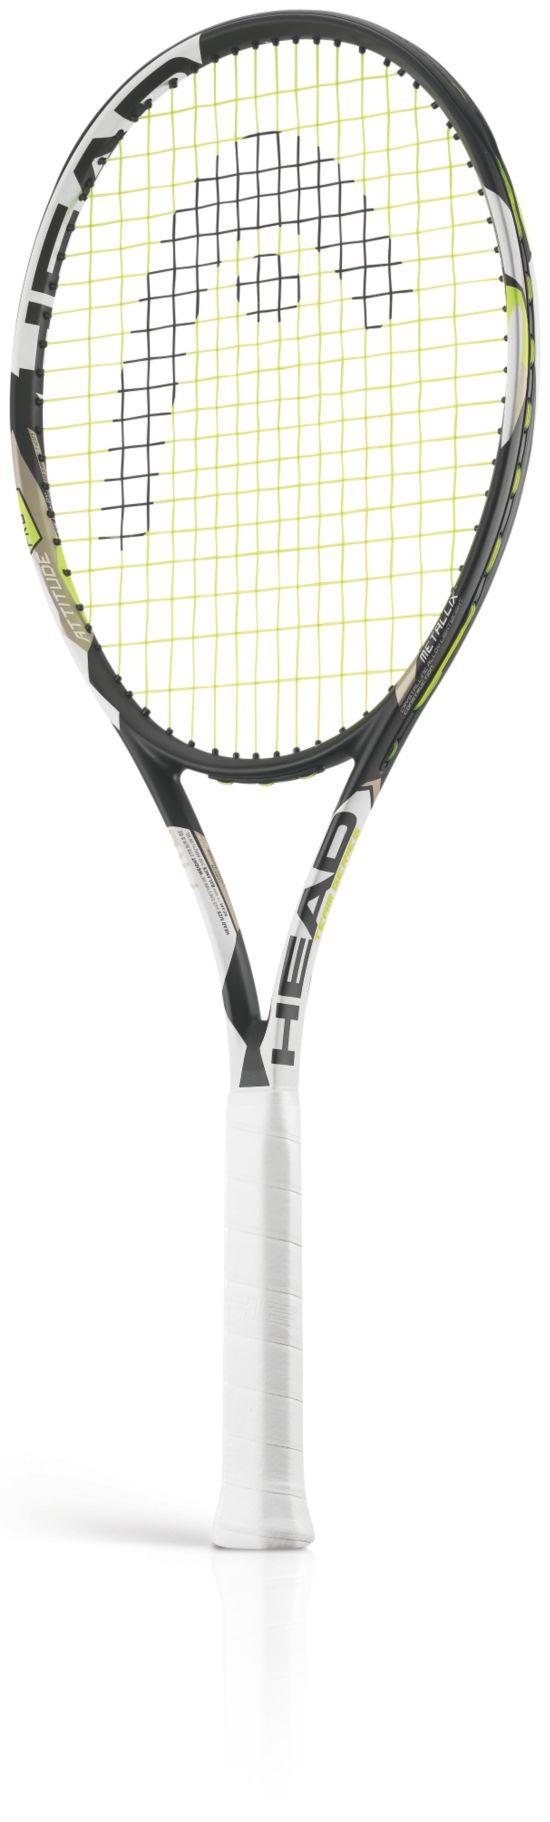 MX Attitude Pro Tennisracket